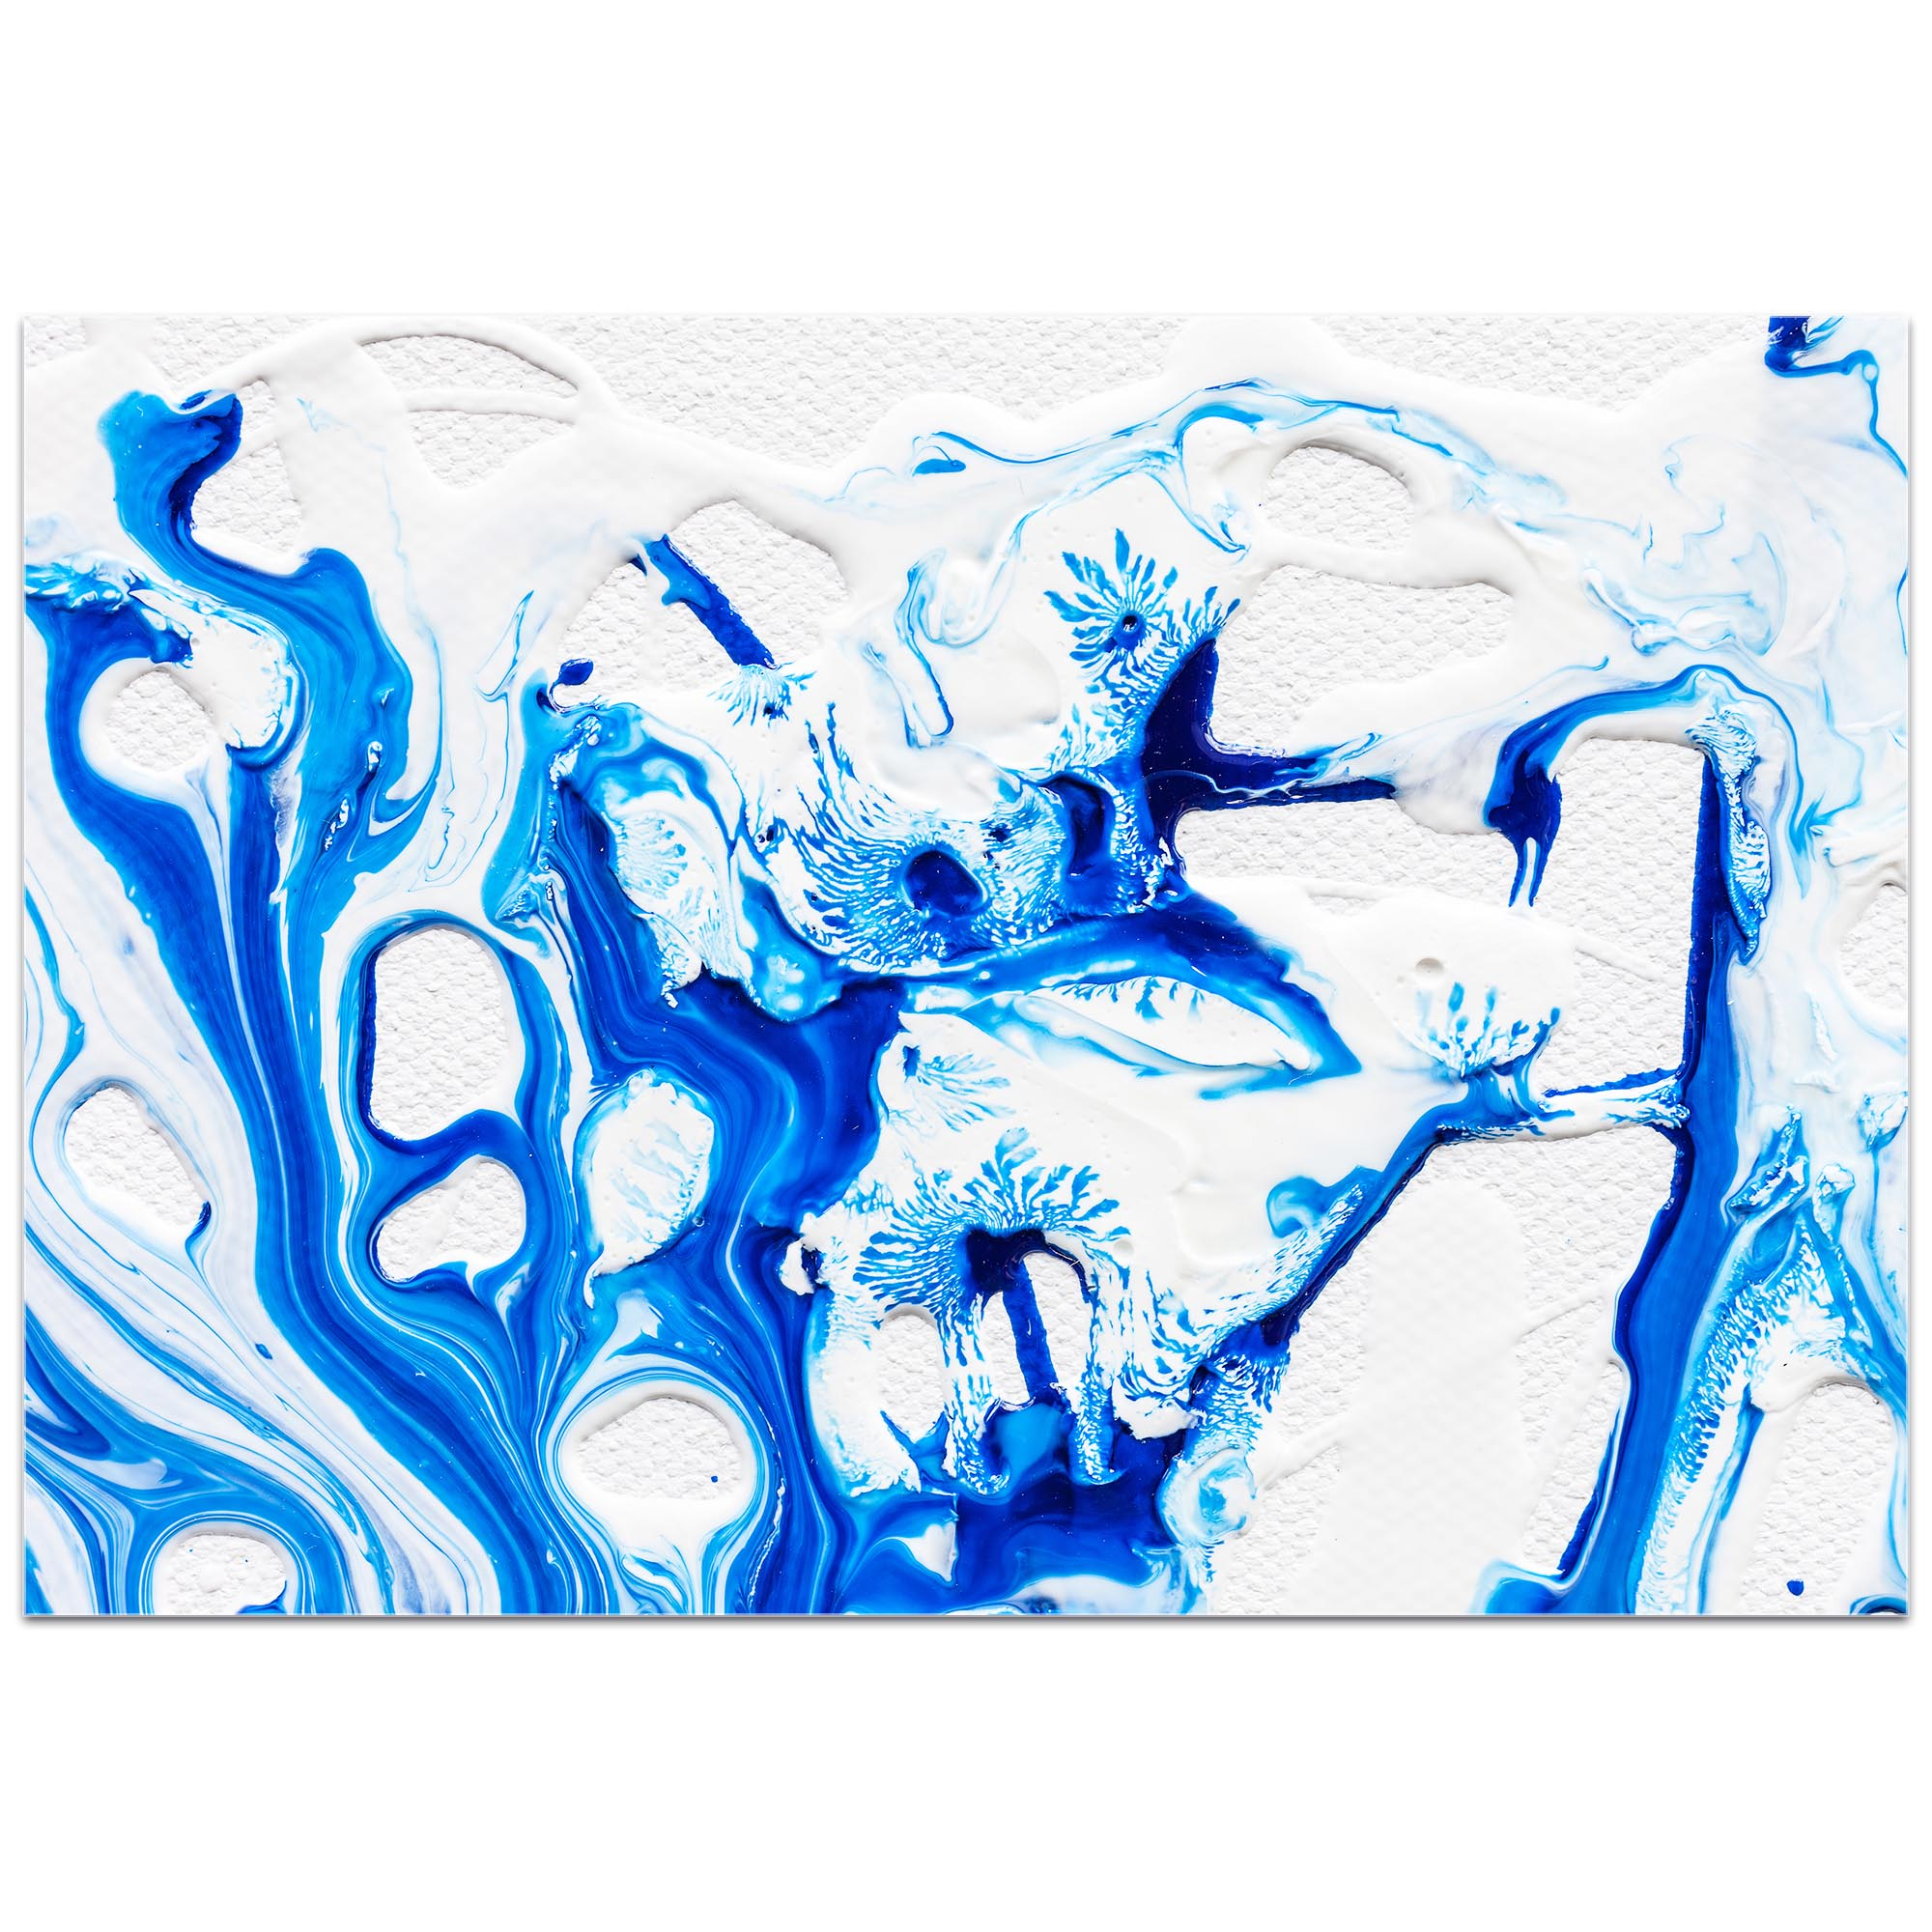 Abstract Wall Art 'Coastal Waters 3' - Colorful Urban Decor on Metal or Plexiglass - Image 2